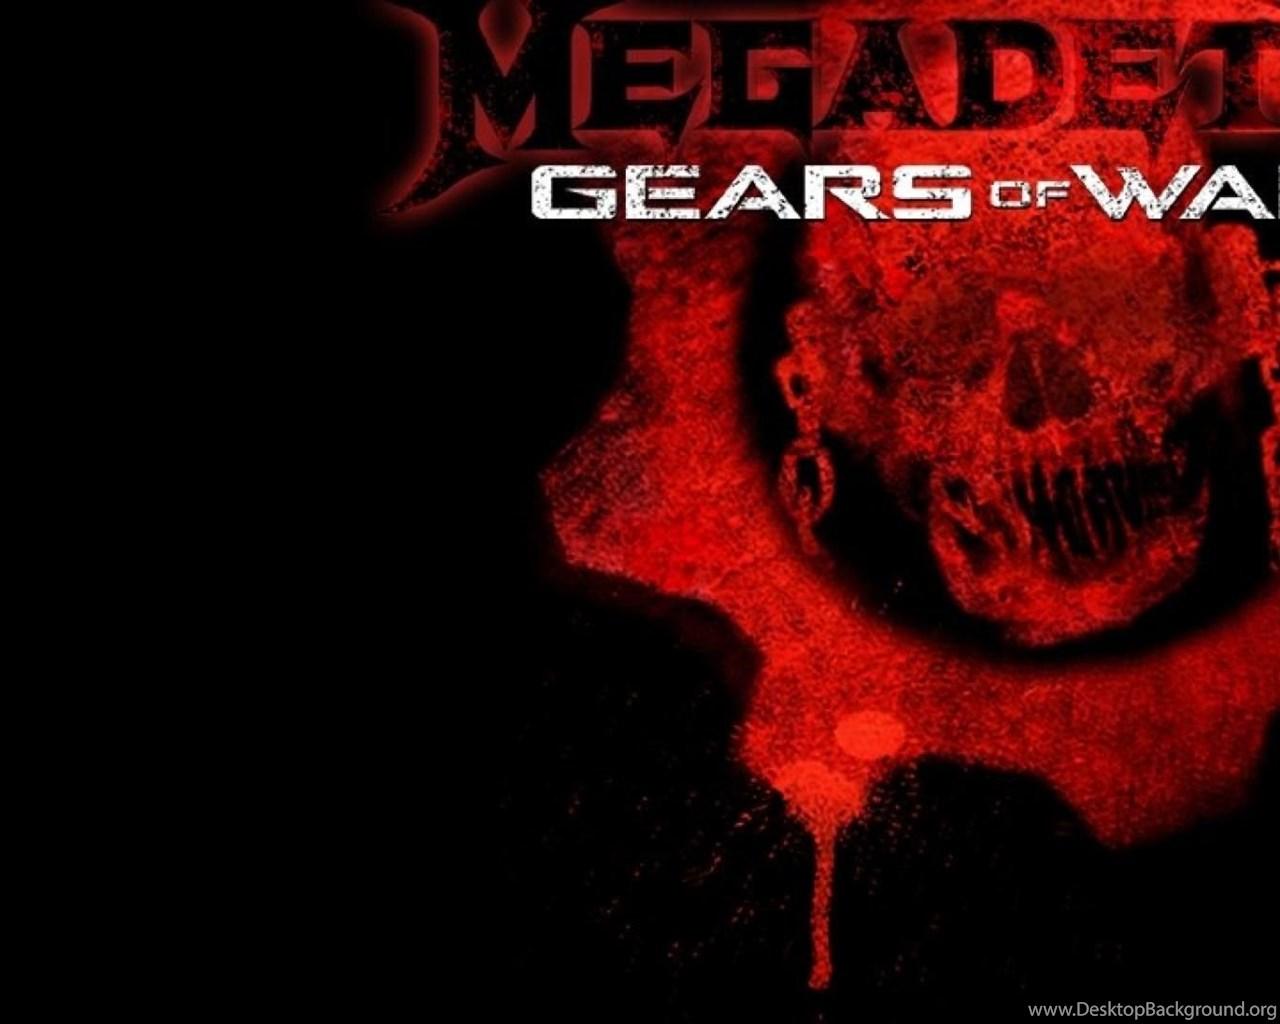 Megadeath Gears Of War Games Logo Hd Wallpapers Desktop Background